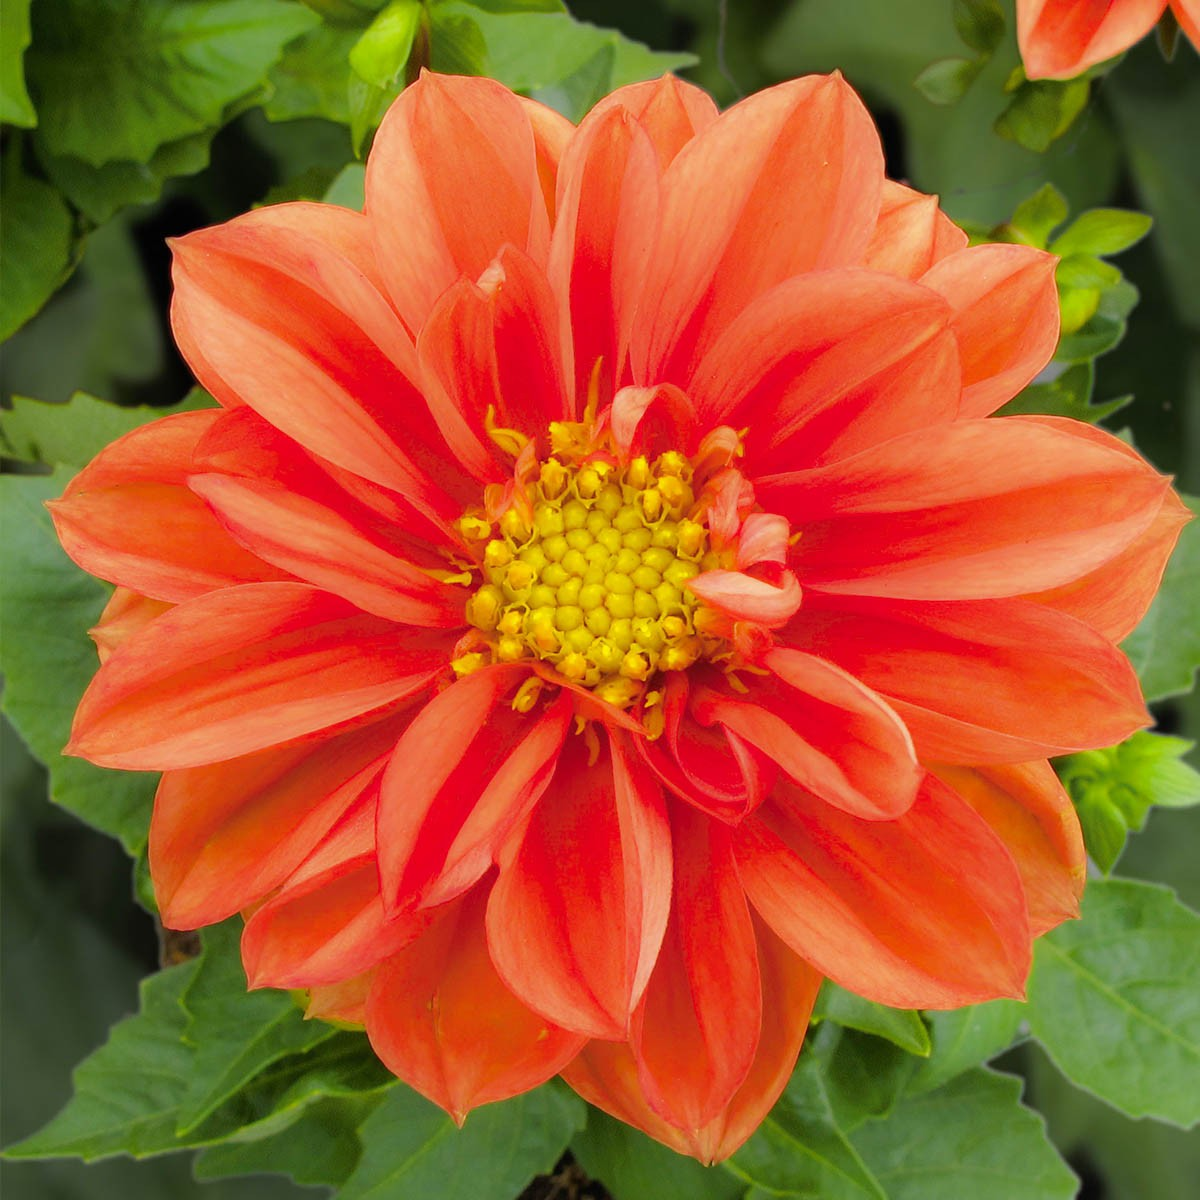 https://www.dahlien.de/wp-content/uploads/2019/12/volmary-pflanzen-blumen-dahlien-lubega-orange-01.jpg